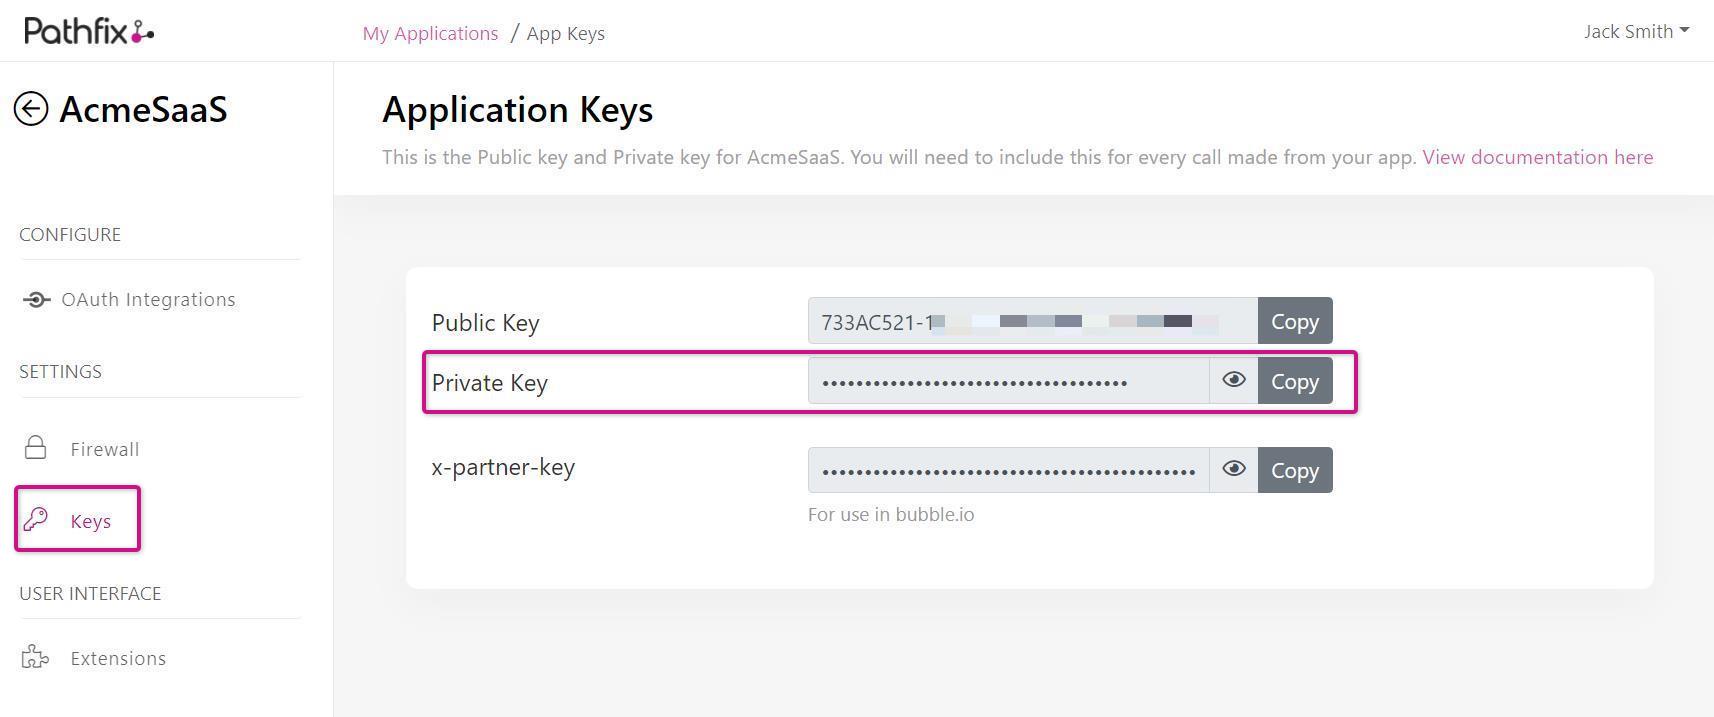 Image: Private Key